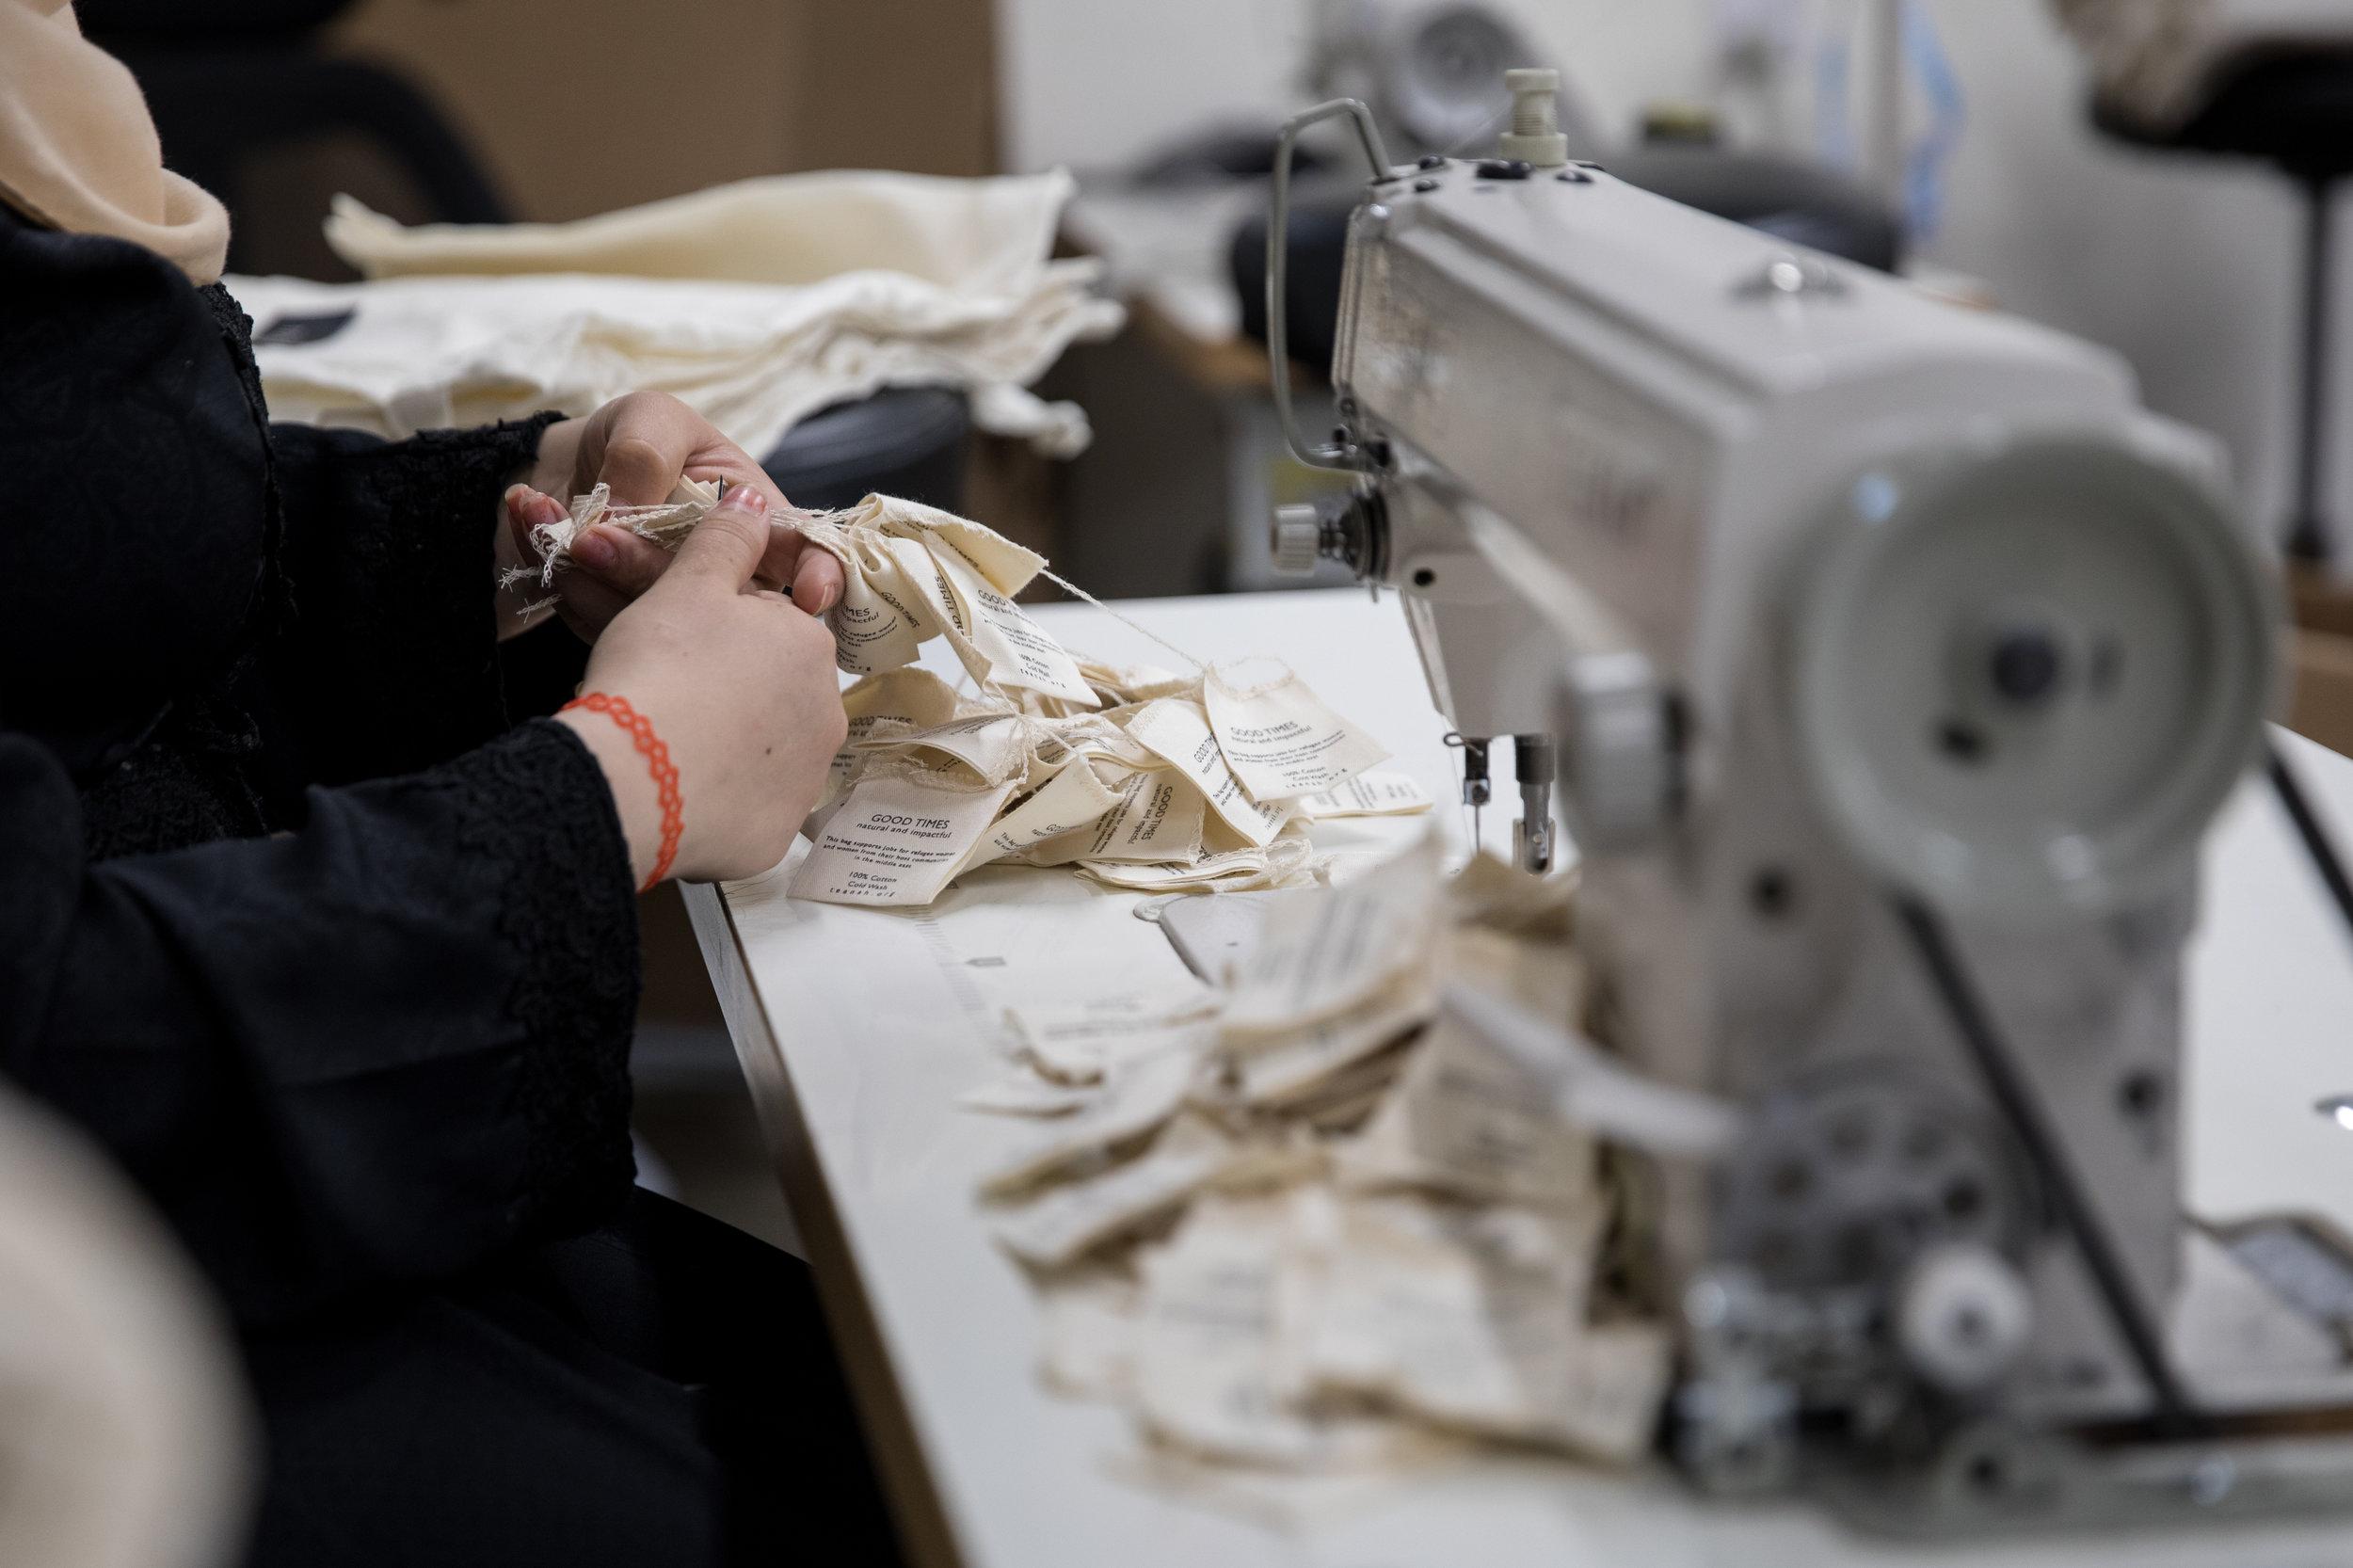 2018-06-23_Raneem Faisal, Teenah textile company, Irbid, JO_d1_0144.jpg